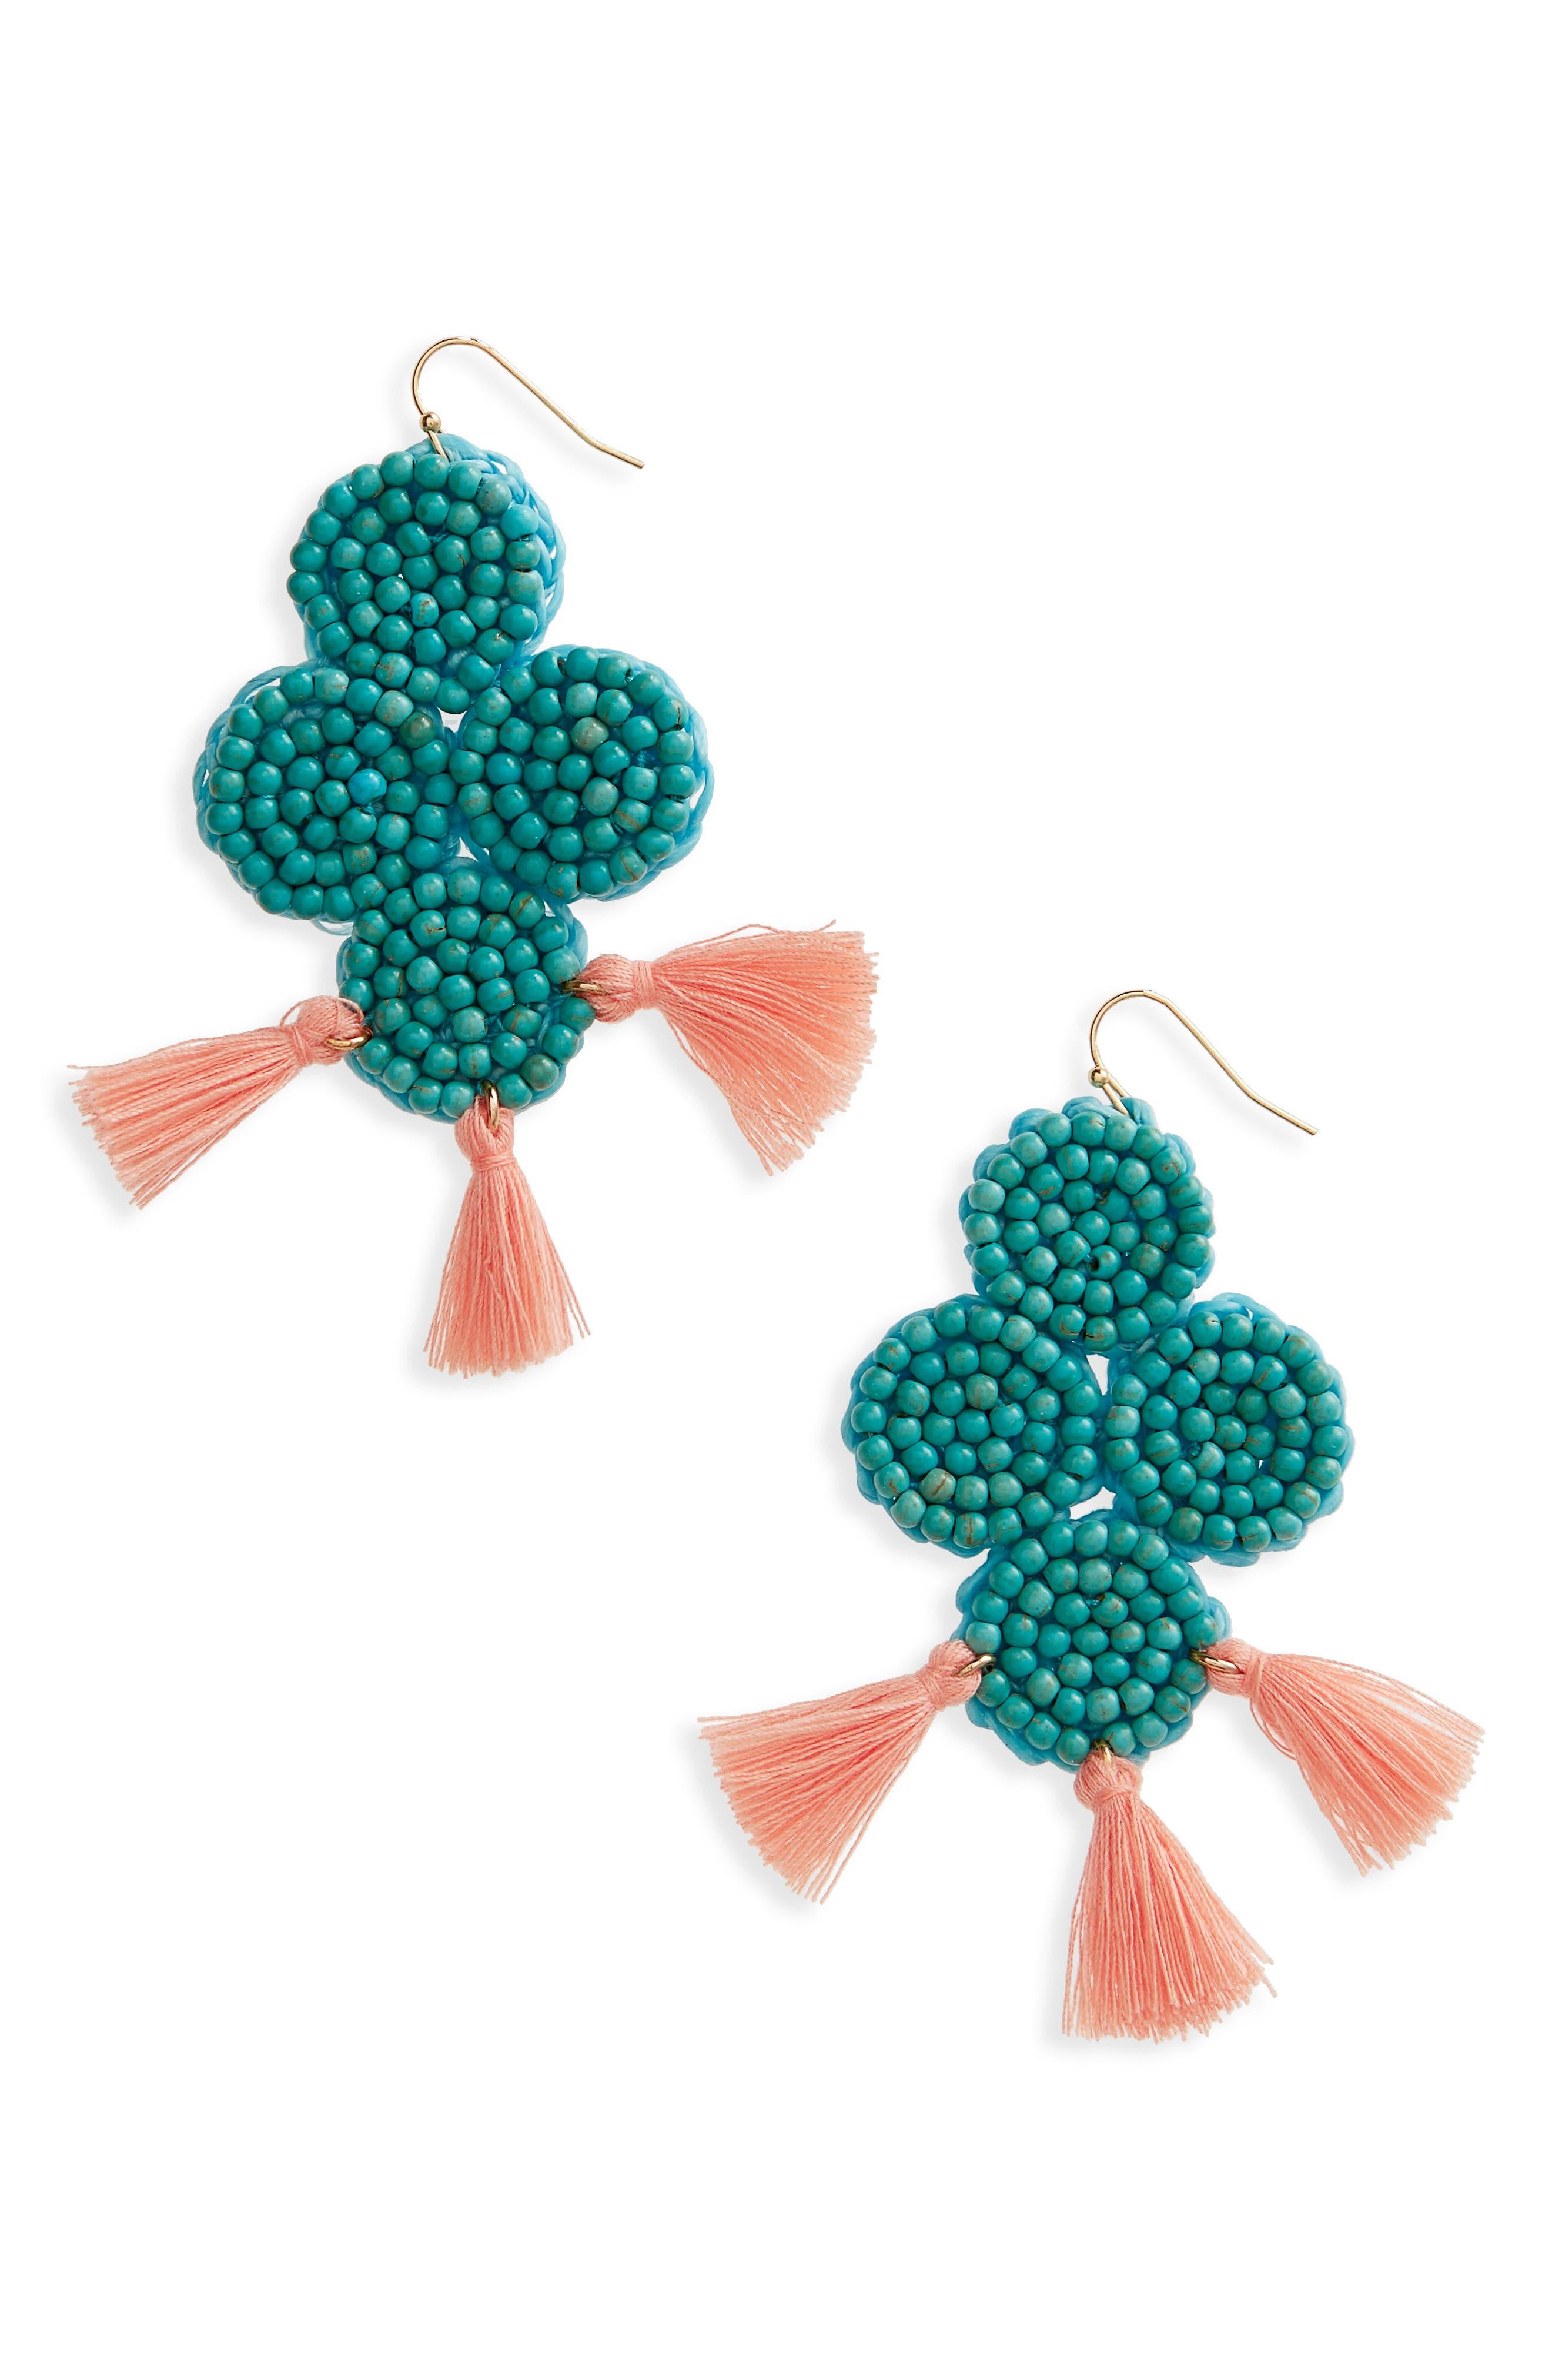 Beaded Statement Earrings,                             Main thumbnail 1, color,                             Blue Multi